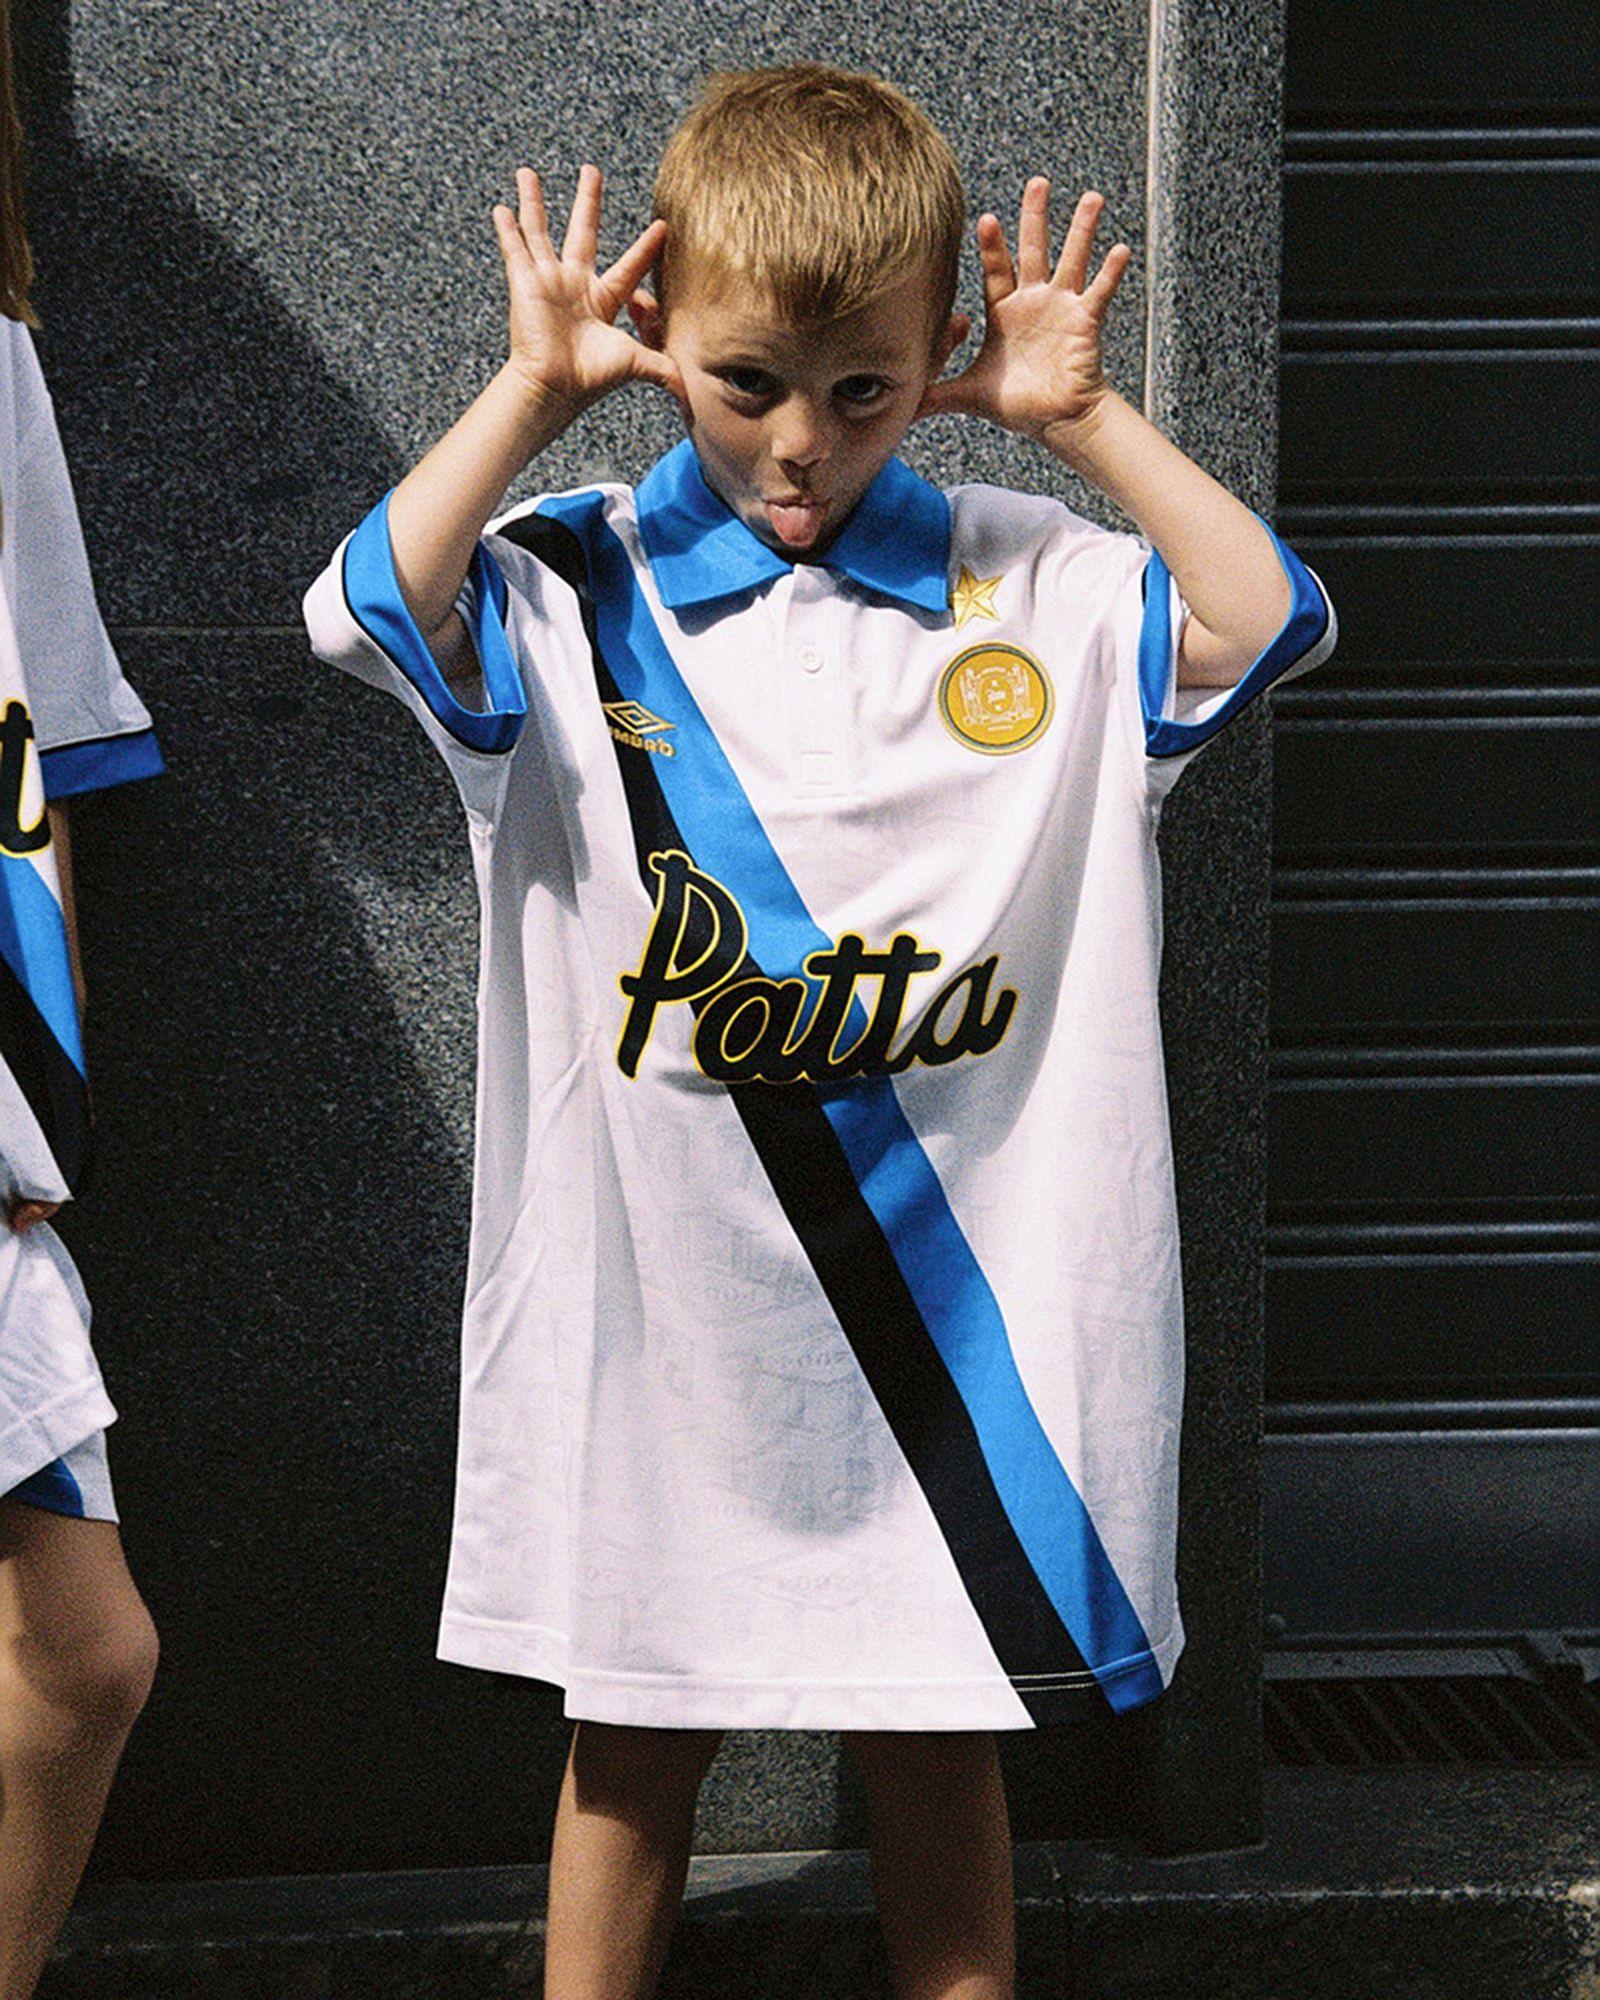 patta-umbro-inter-away-jersey-release-date-price-05